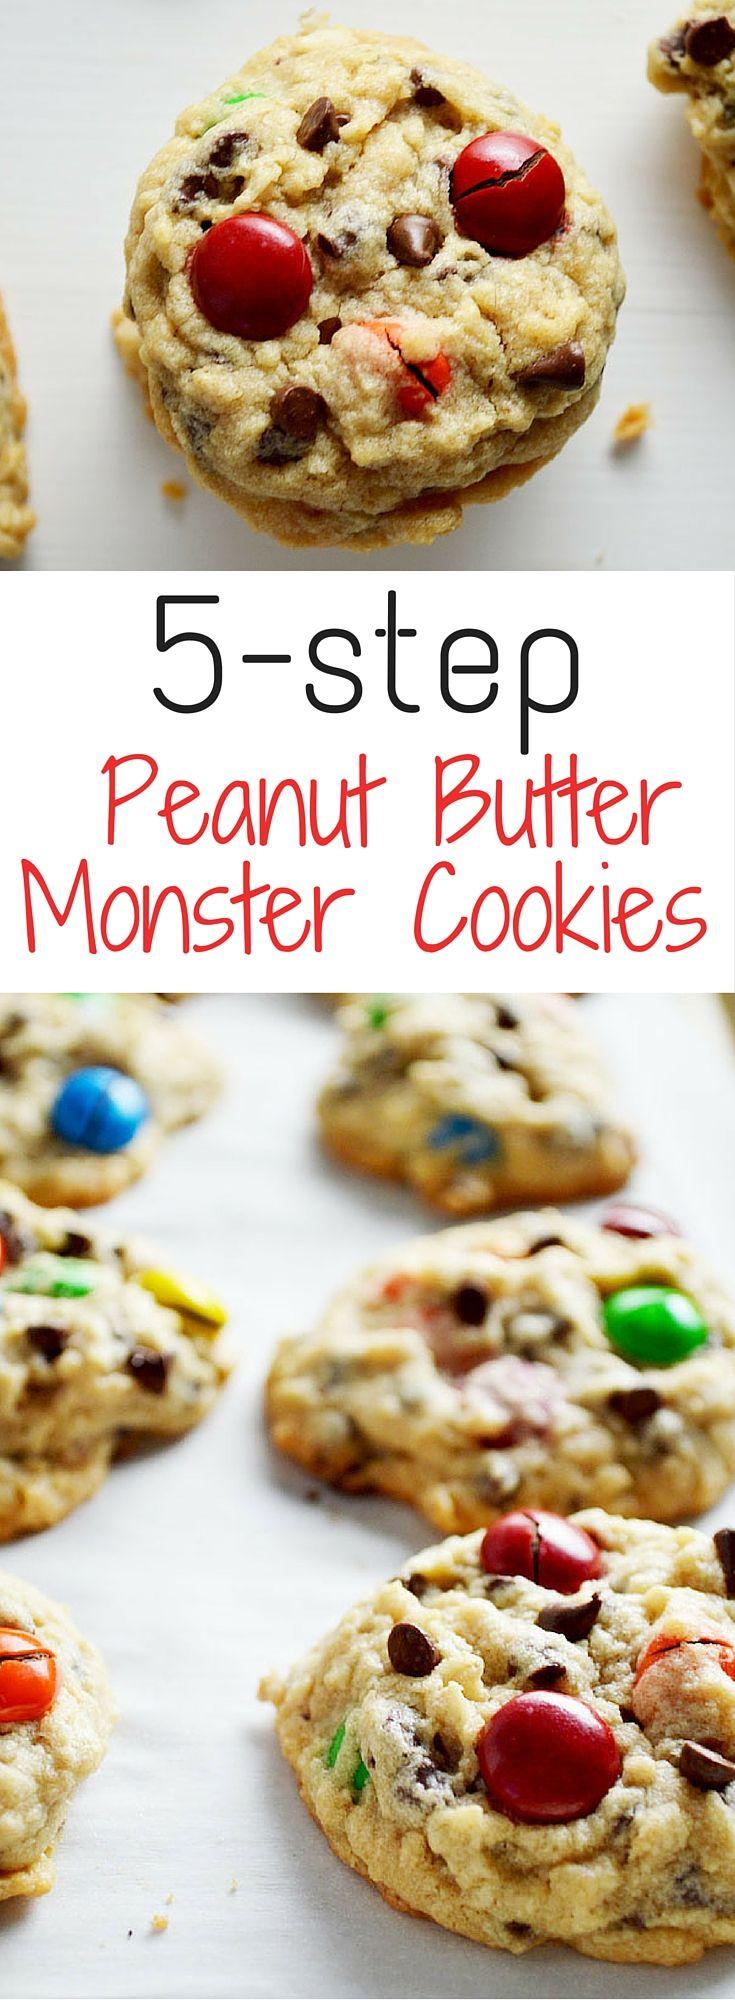 5 Step Peanut Butter Monster Cookies The Diy Foodie Recipe Low Carb Cookies Recipes Diy Food Recipes Desserts